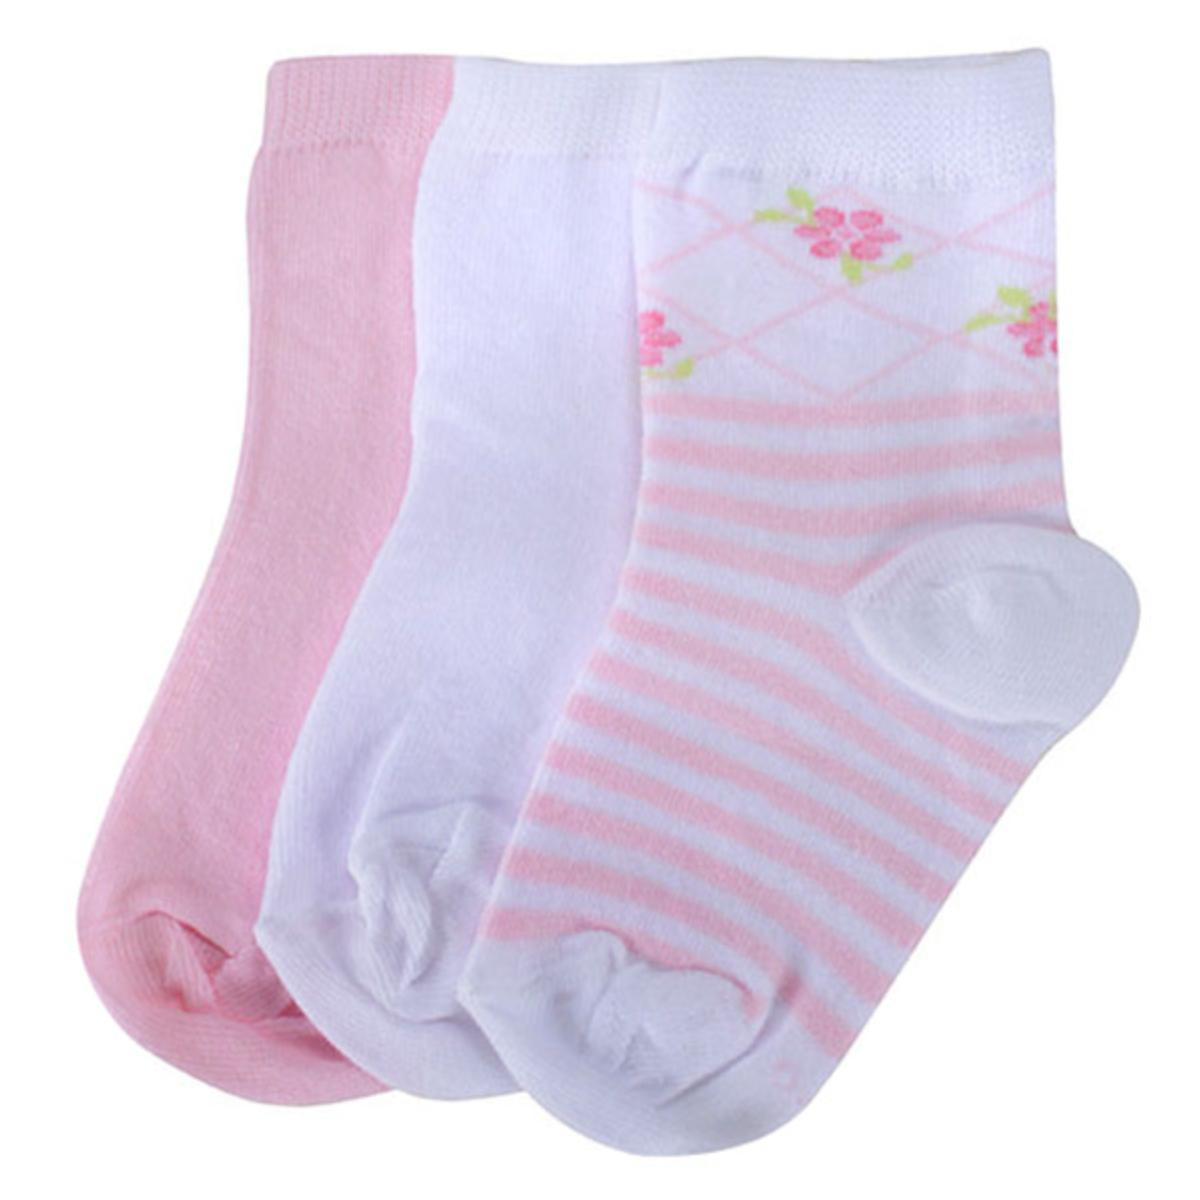 Meia Fem Infantil Lupo 02678 089 0936 Kit C/3 Rosa/branco